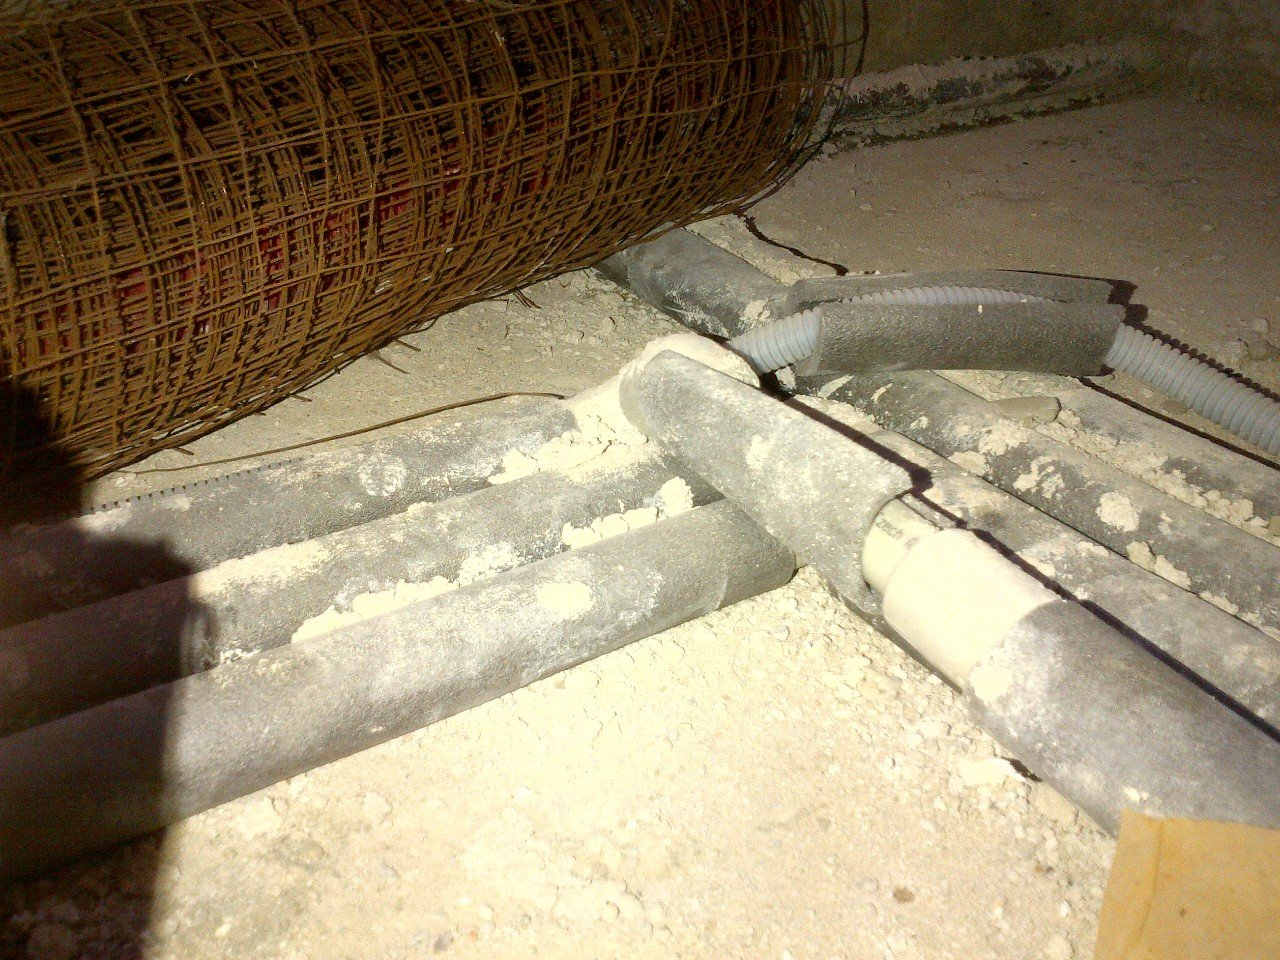 Rozvod vody v podlaze  - Diskuze TZB-info 9bce2289df5